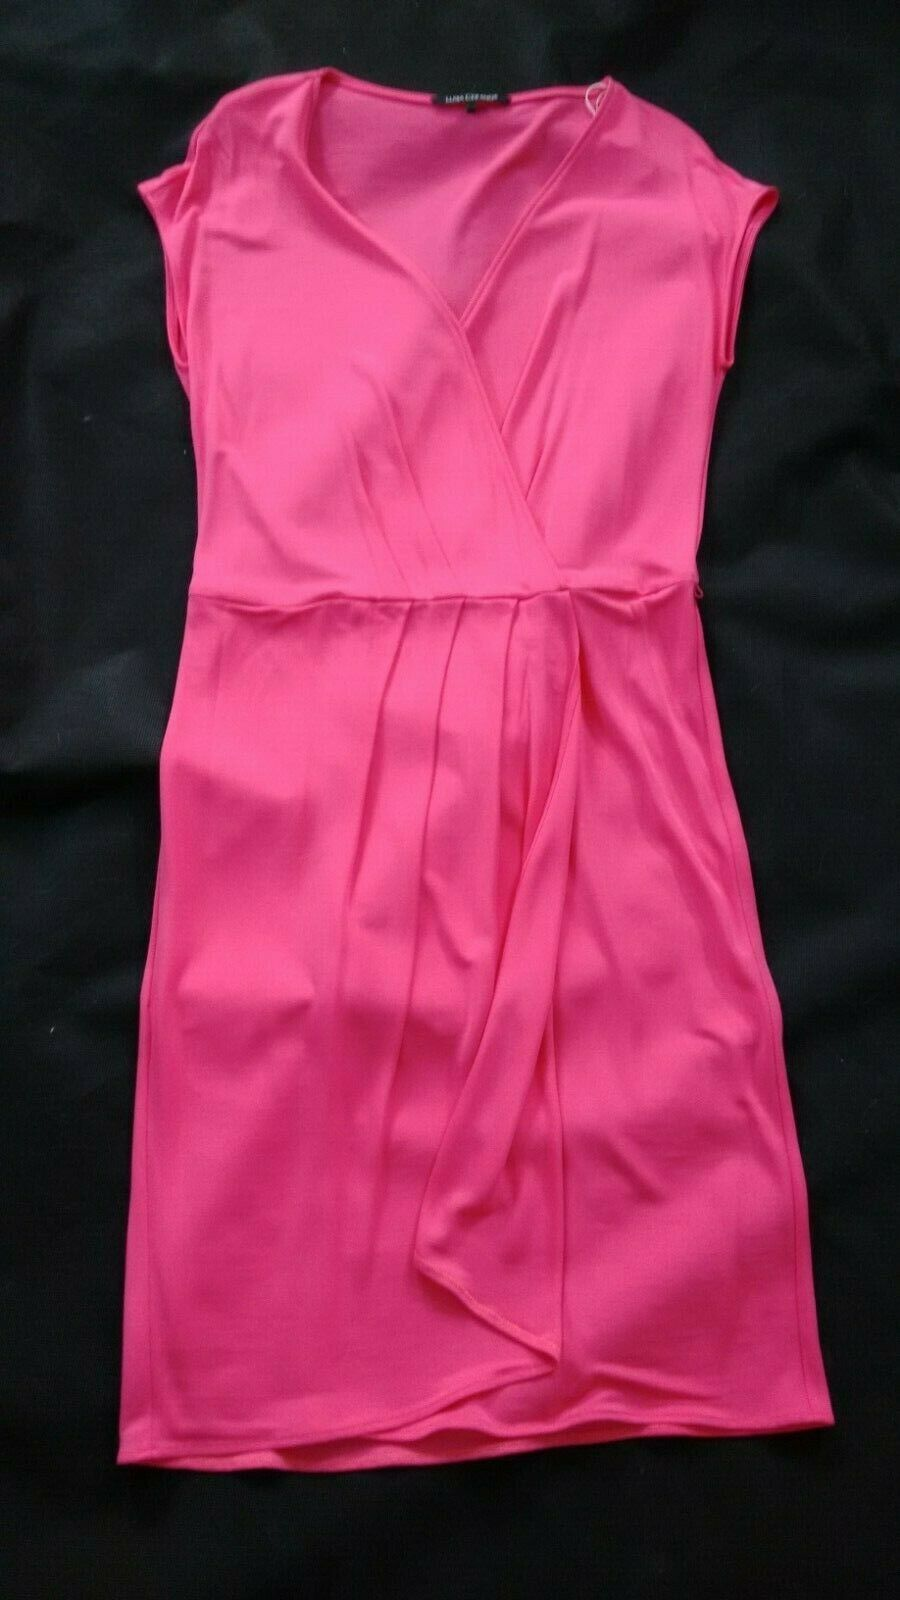 LUISA CERANO Kleid Sommerkleid Rosa Rosa  Gr 40 Falten Shirtkleid NEU